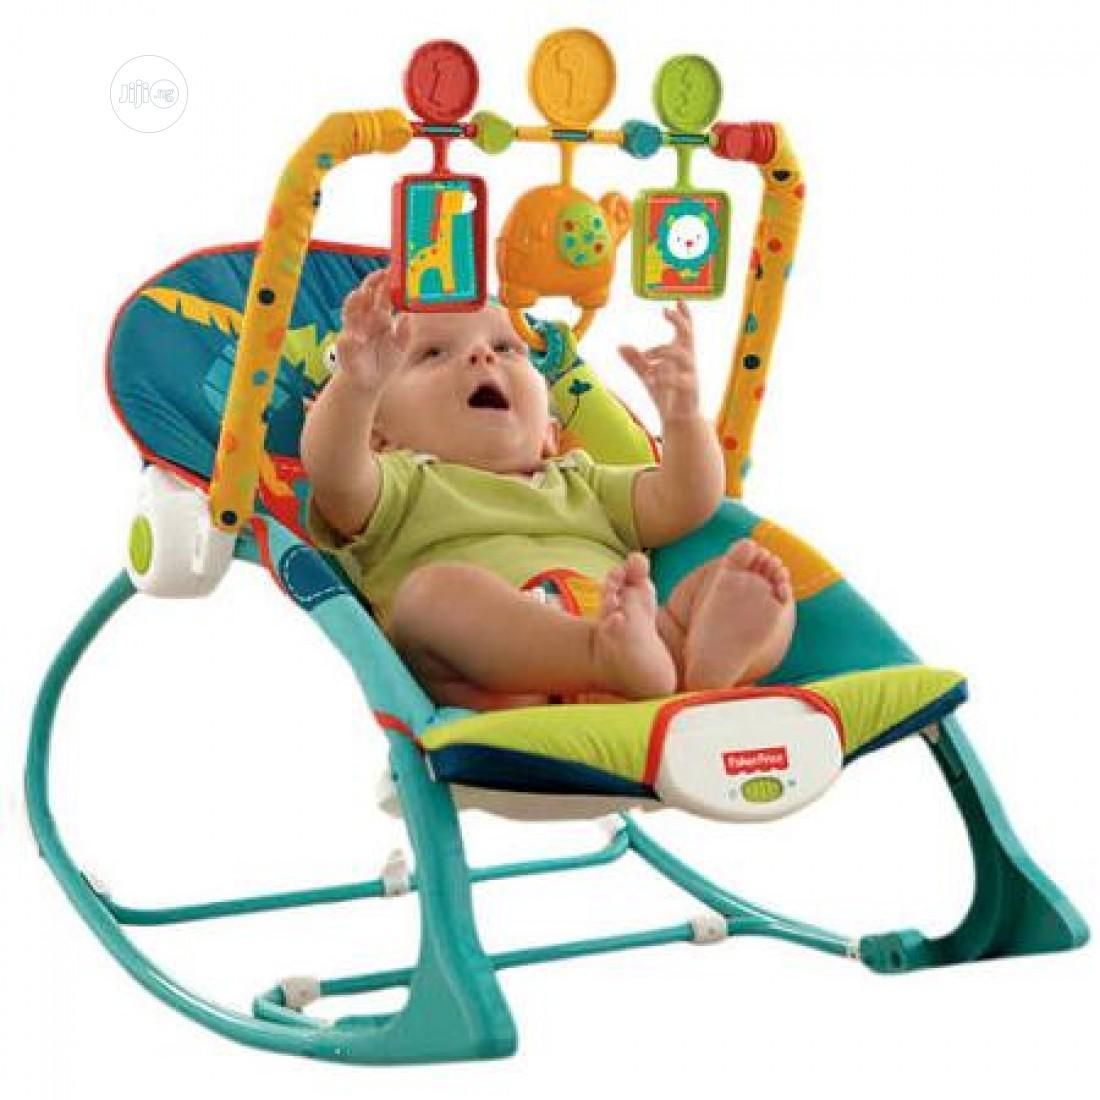 Archive: Infant to Toddler Rocker, Multi